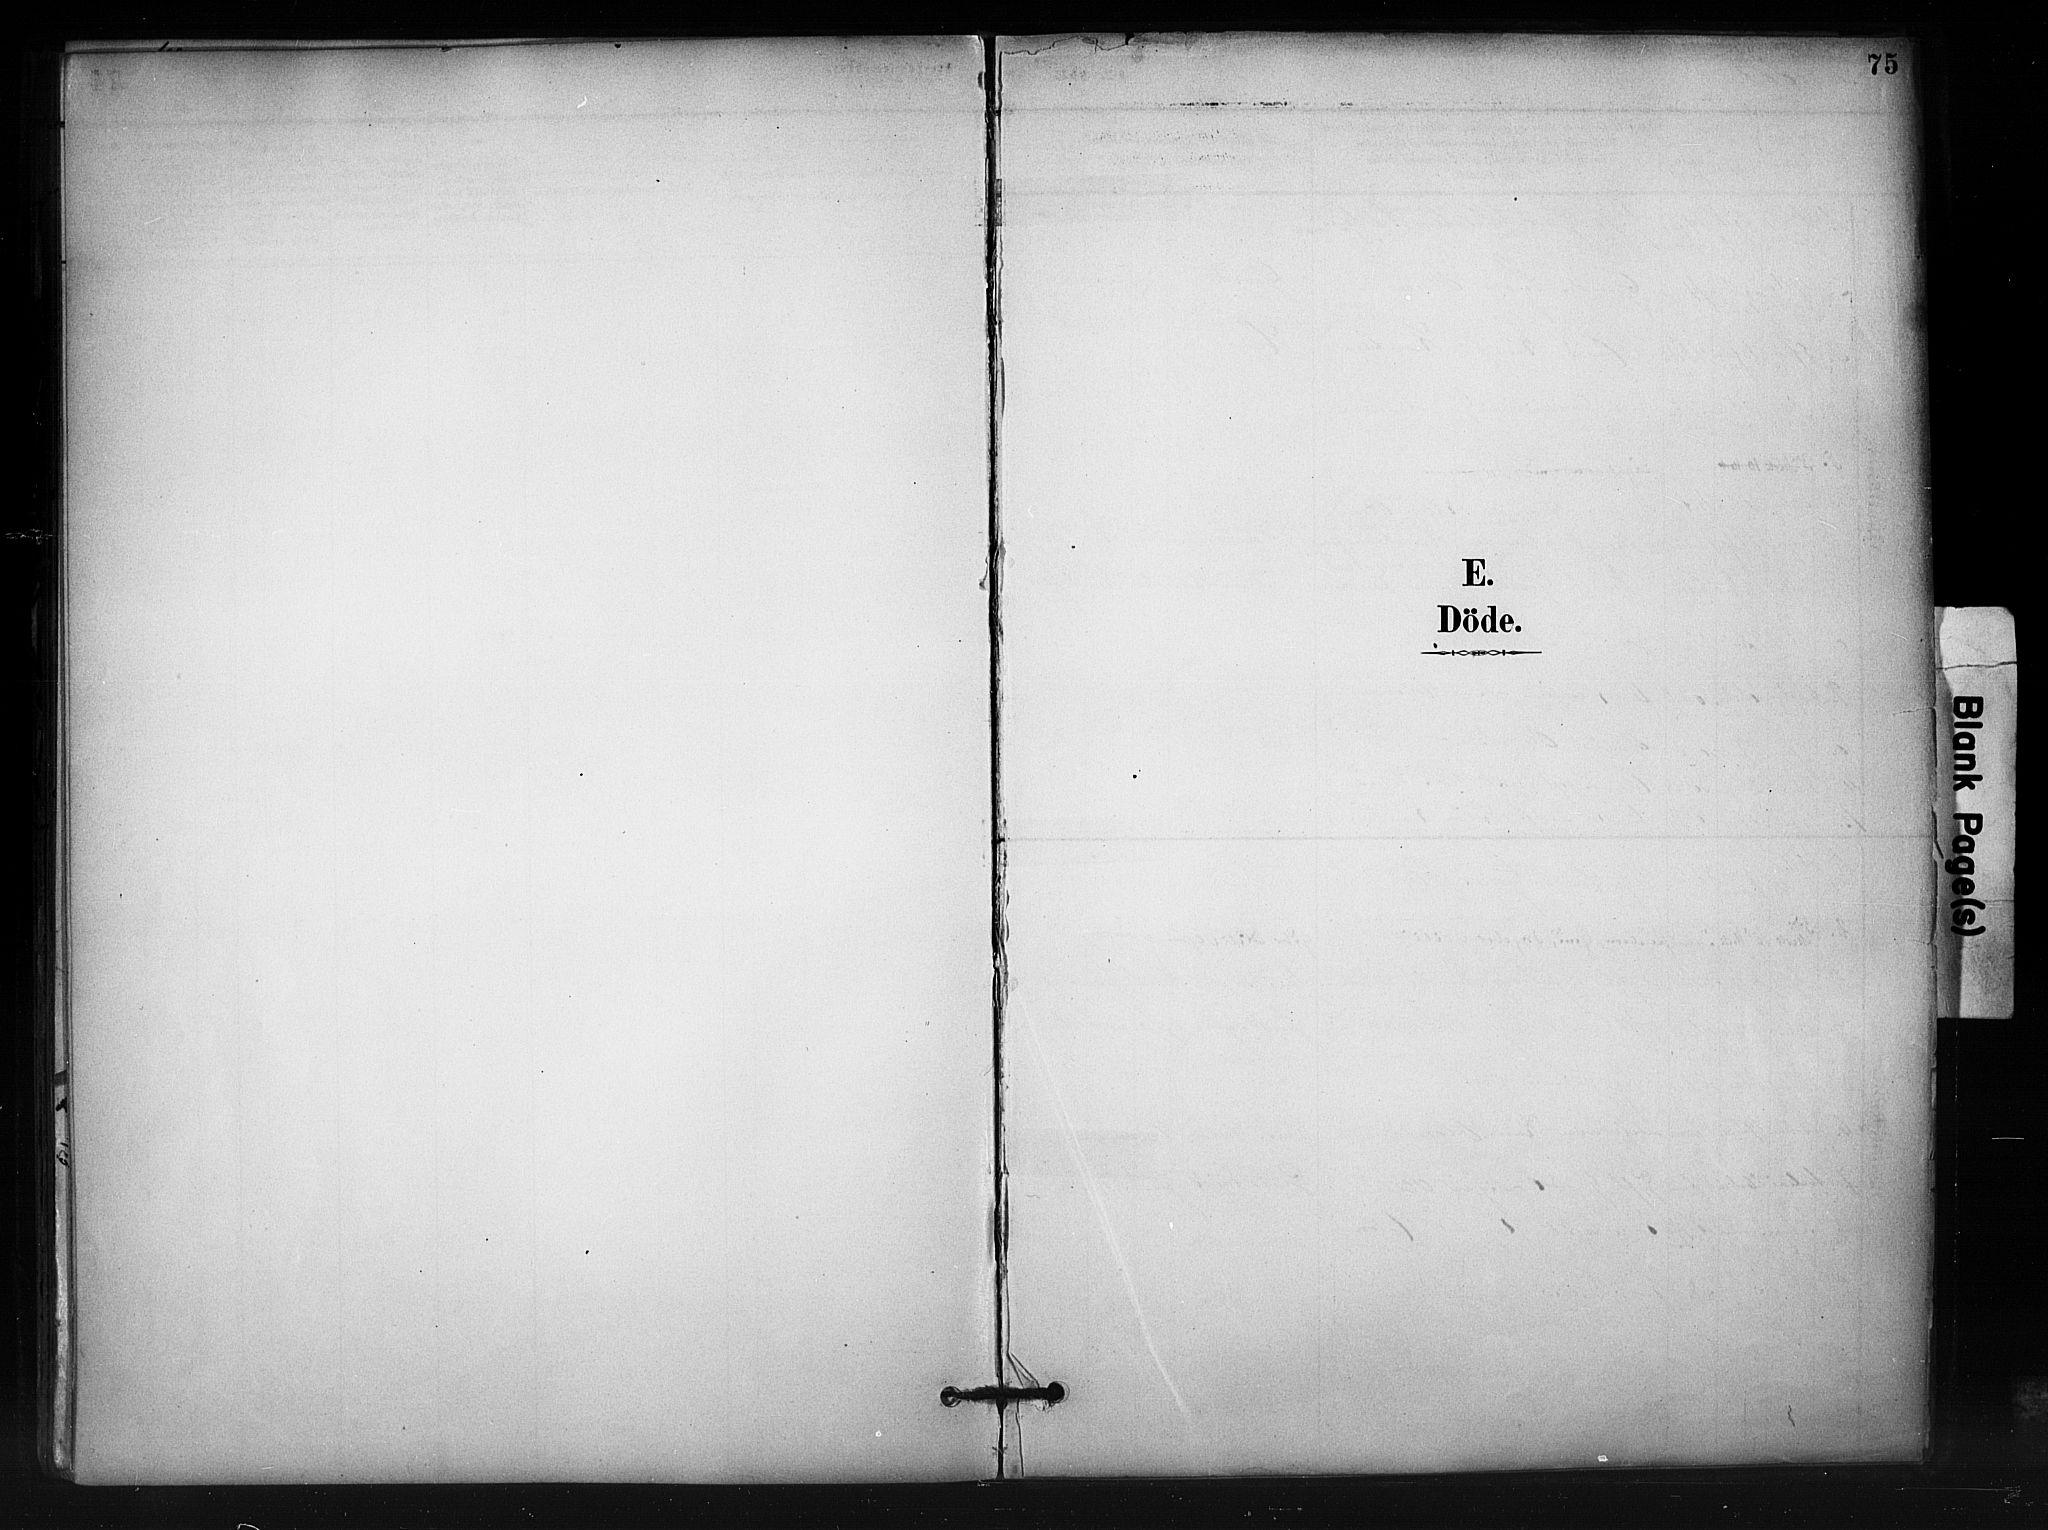 SAH, Nord-Aurdal prestekontor, Ministerialbok nr. 12, 1883-1895, s. 75